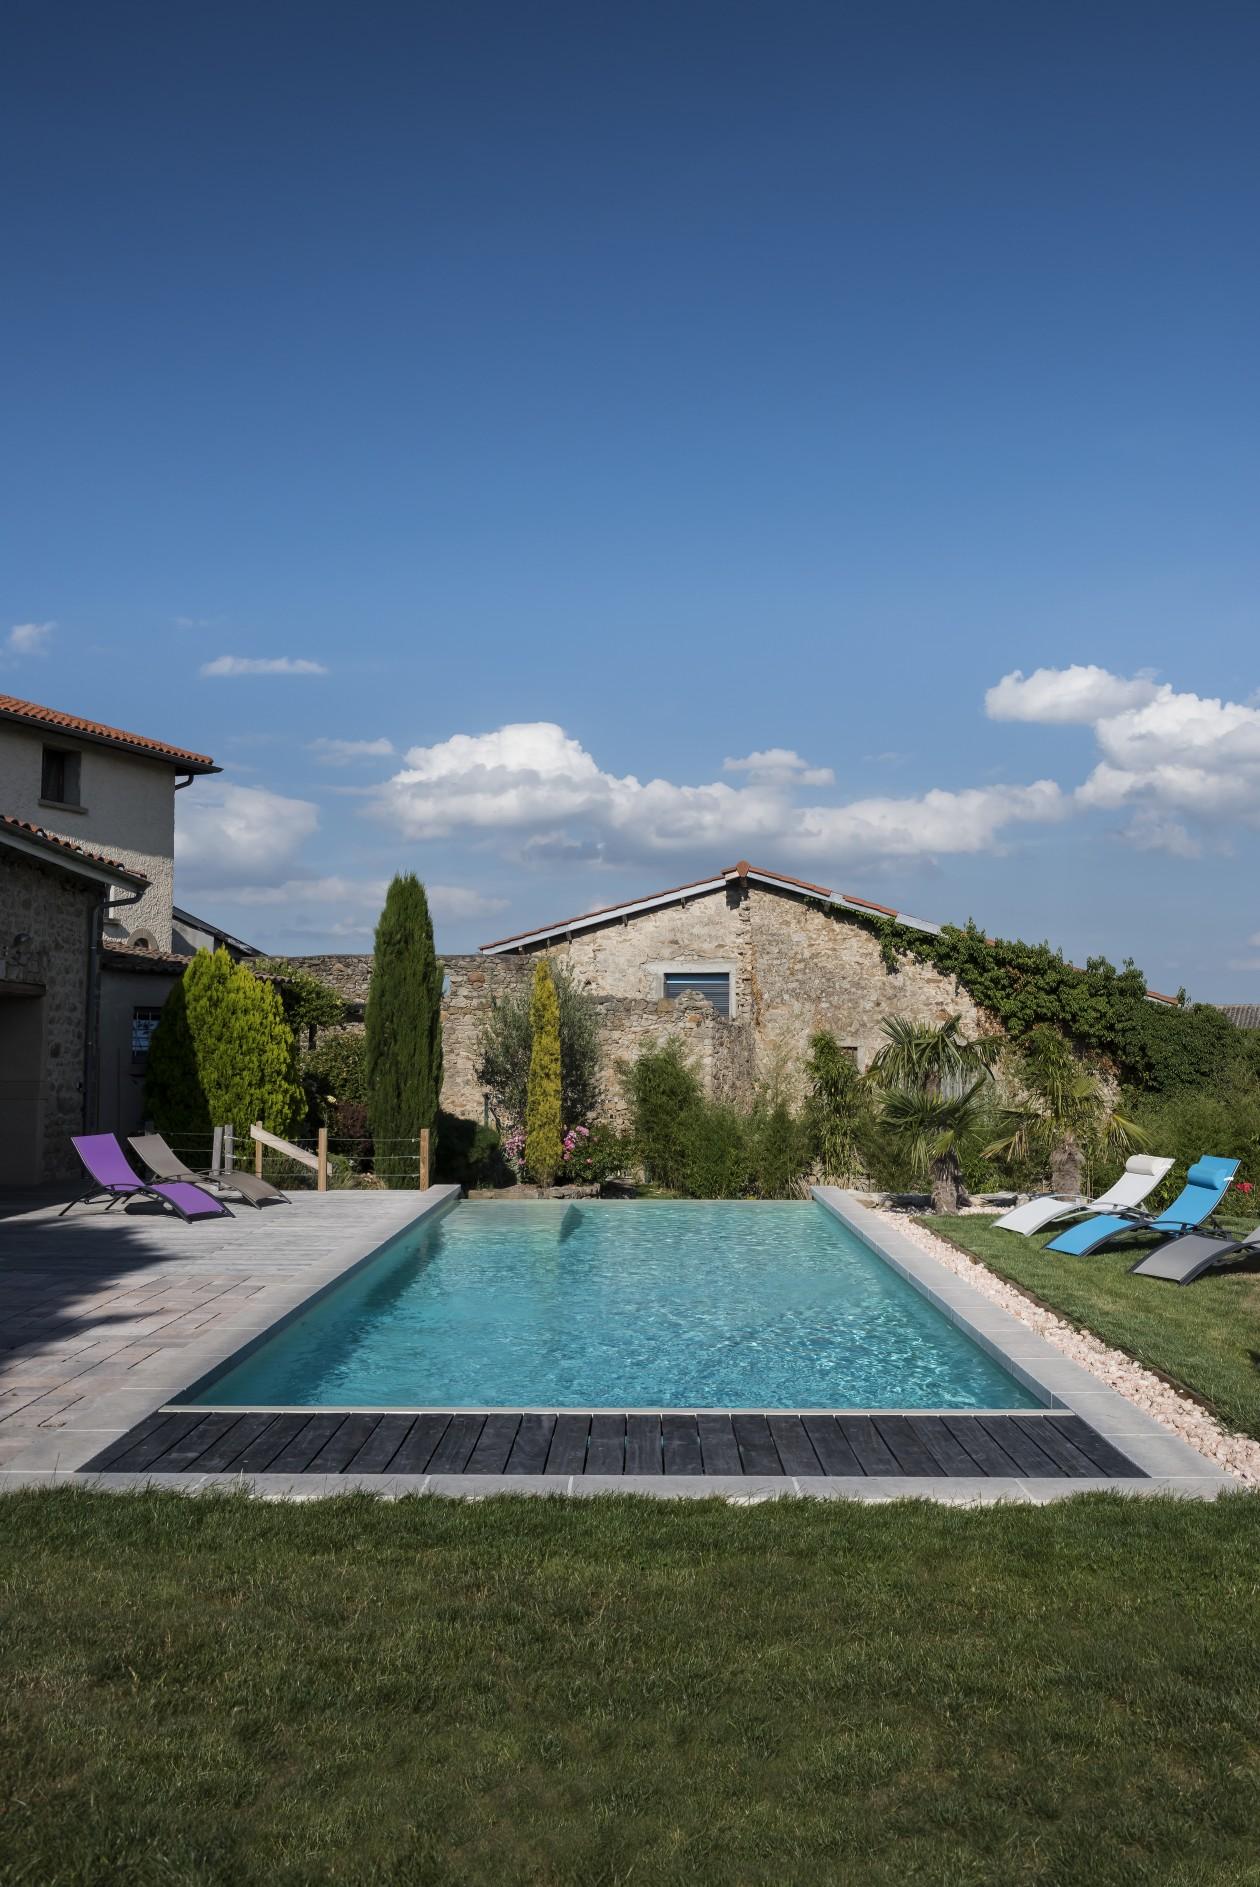 Piscine d bordement style bassin mont du lyonnais for Piscine concept